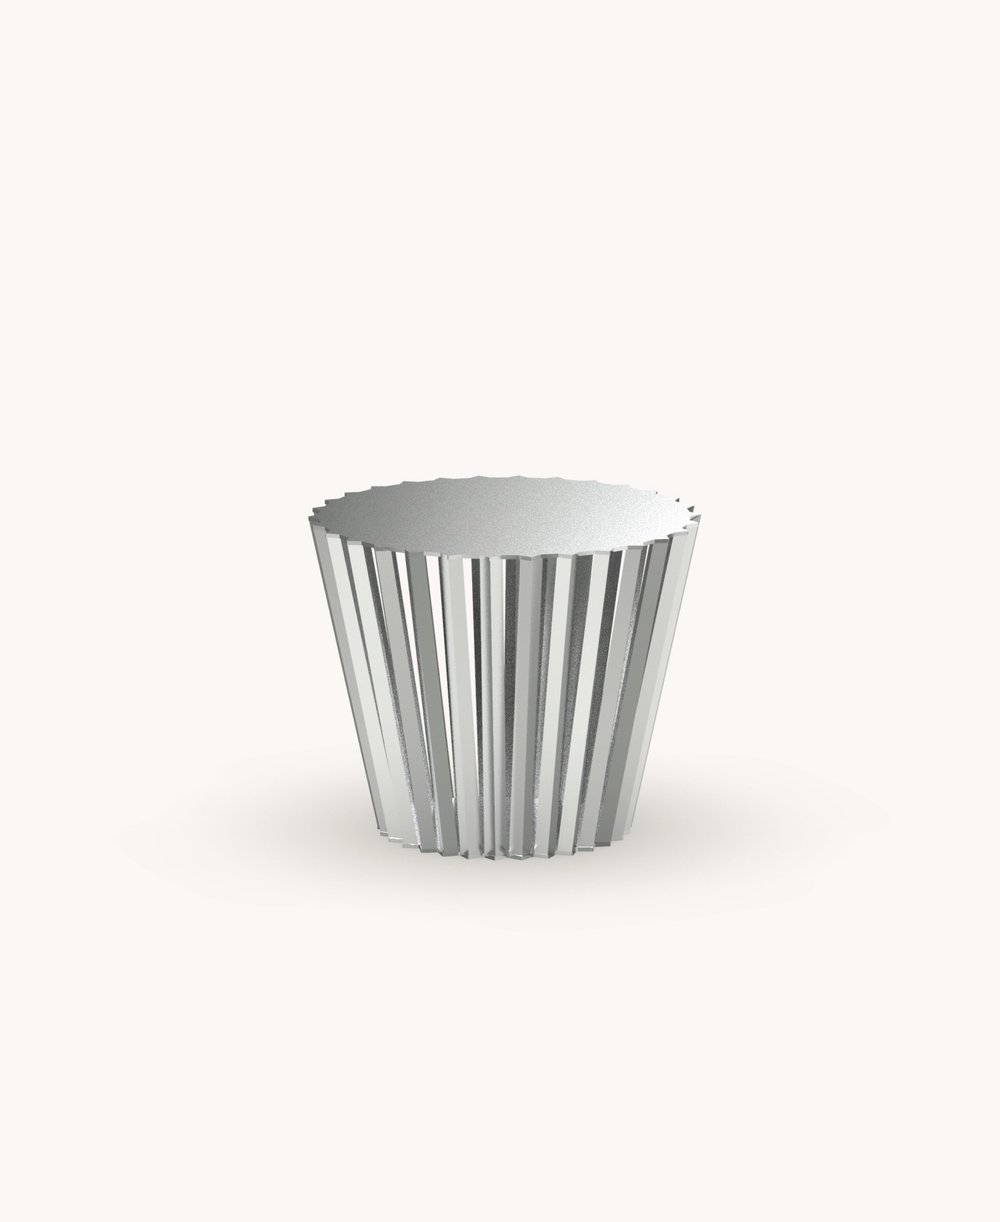 COFFEE TABLE. MACARON - DKK 17.950 · EUR 2407